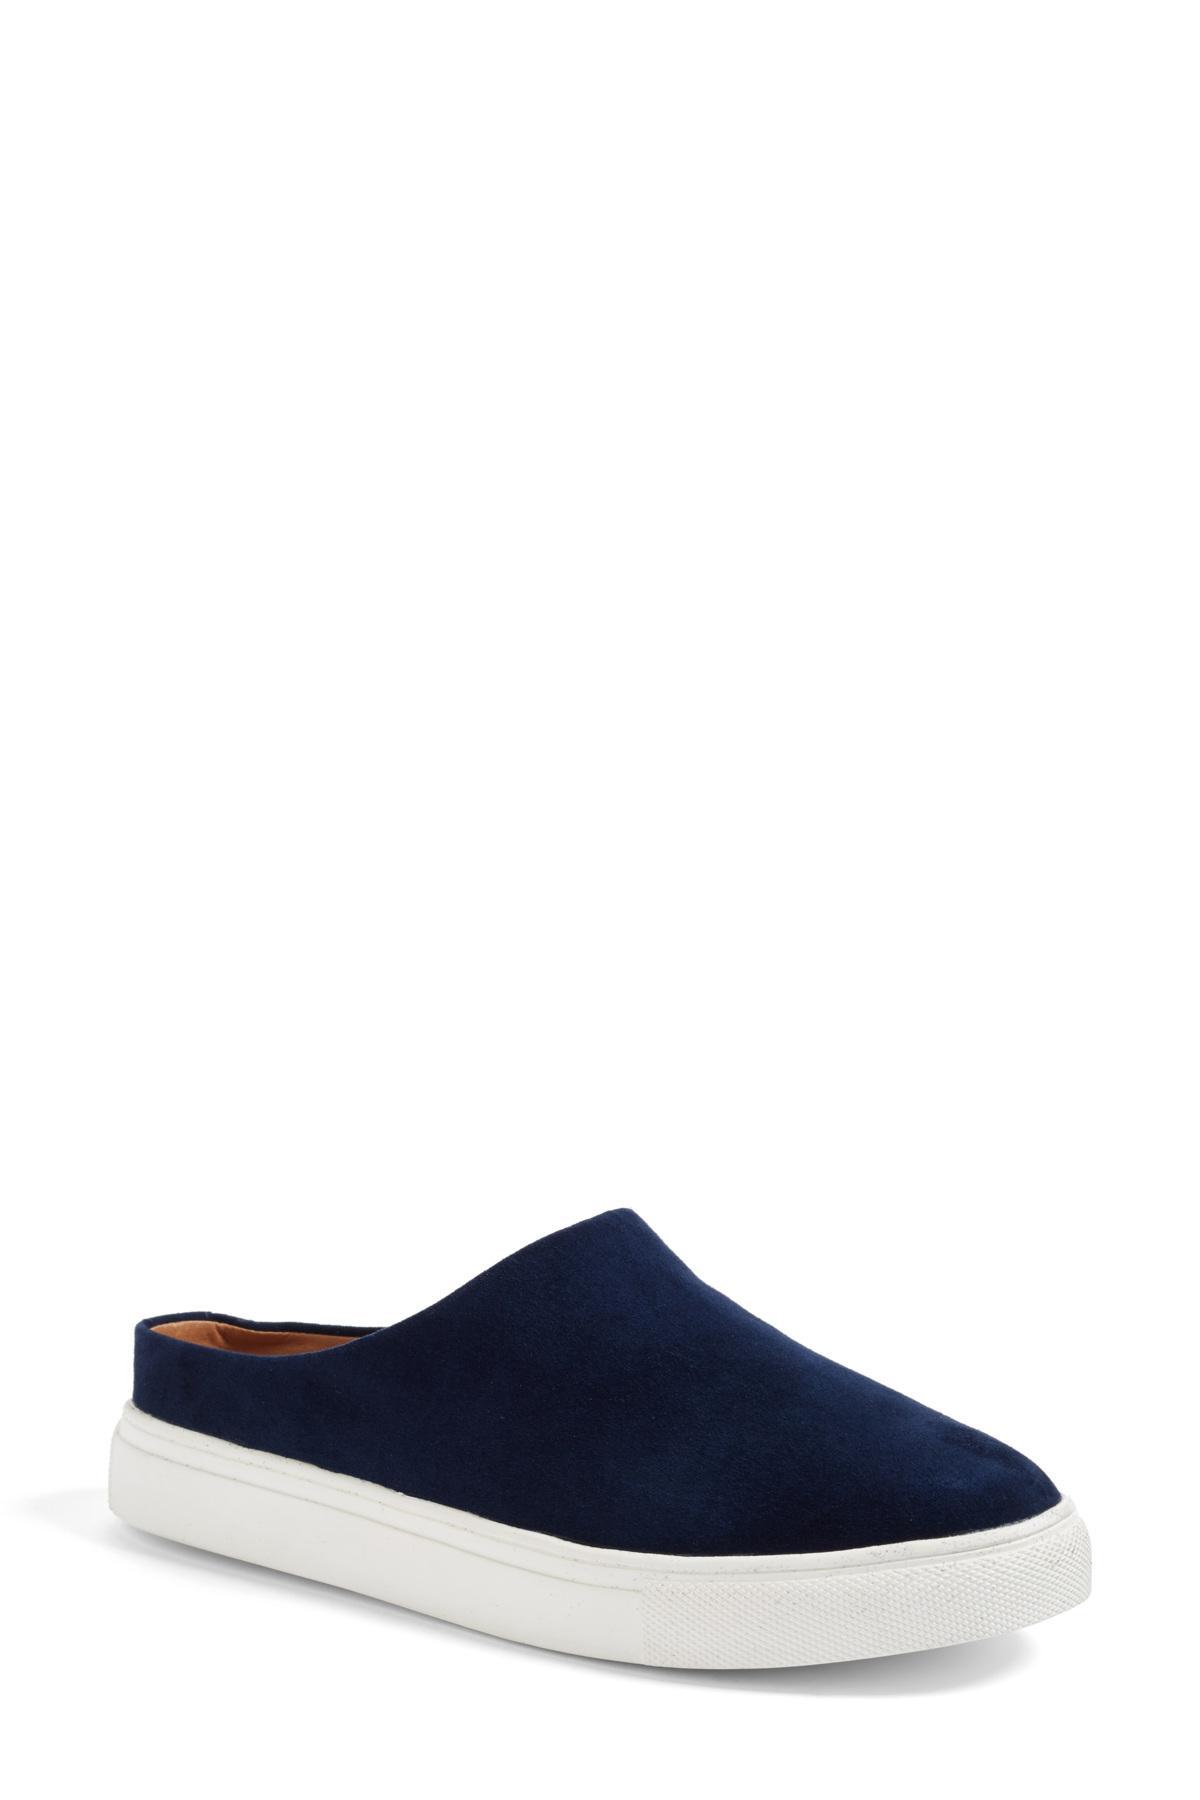 Lyst - Caslon Caslon Gabe Backless Platform Sneaker in Blue